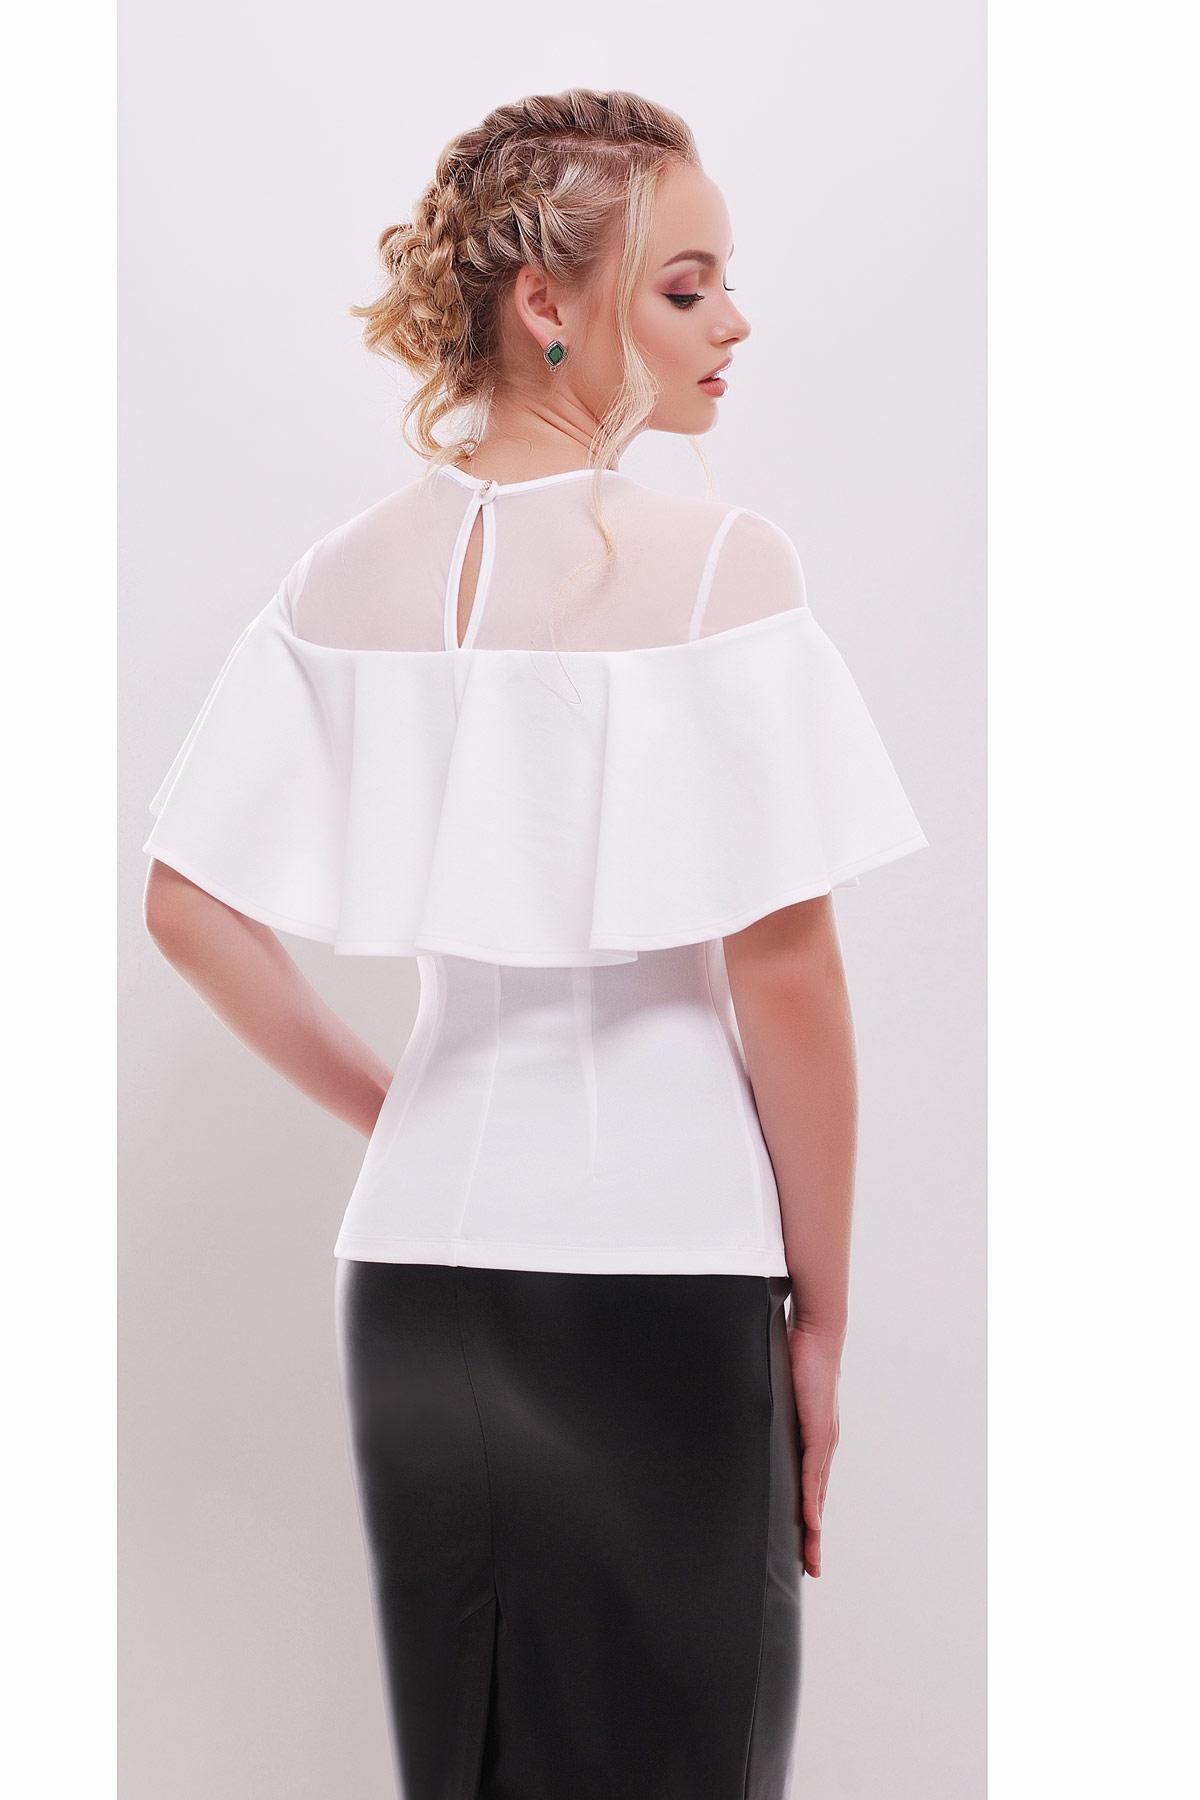 Купить нарядную блузку